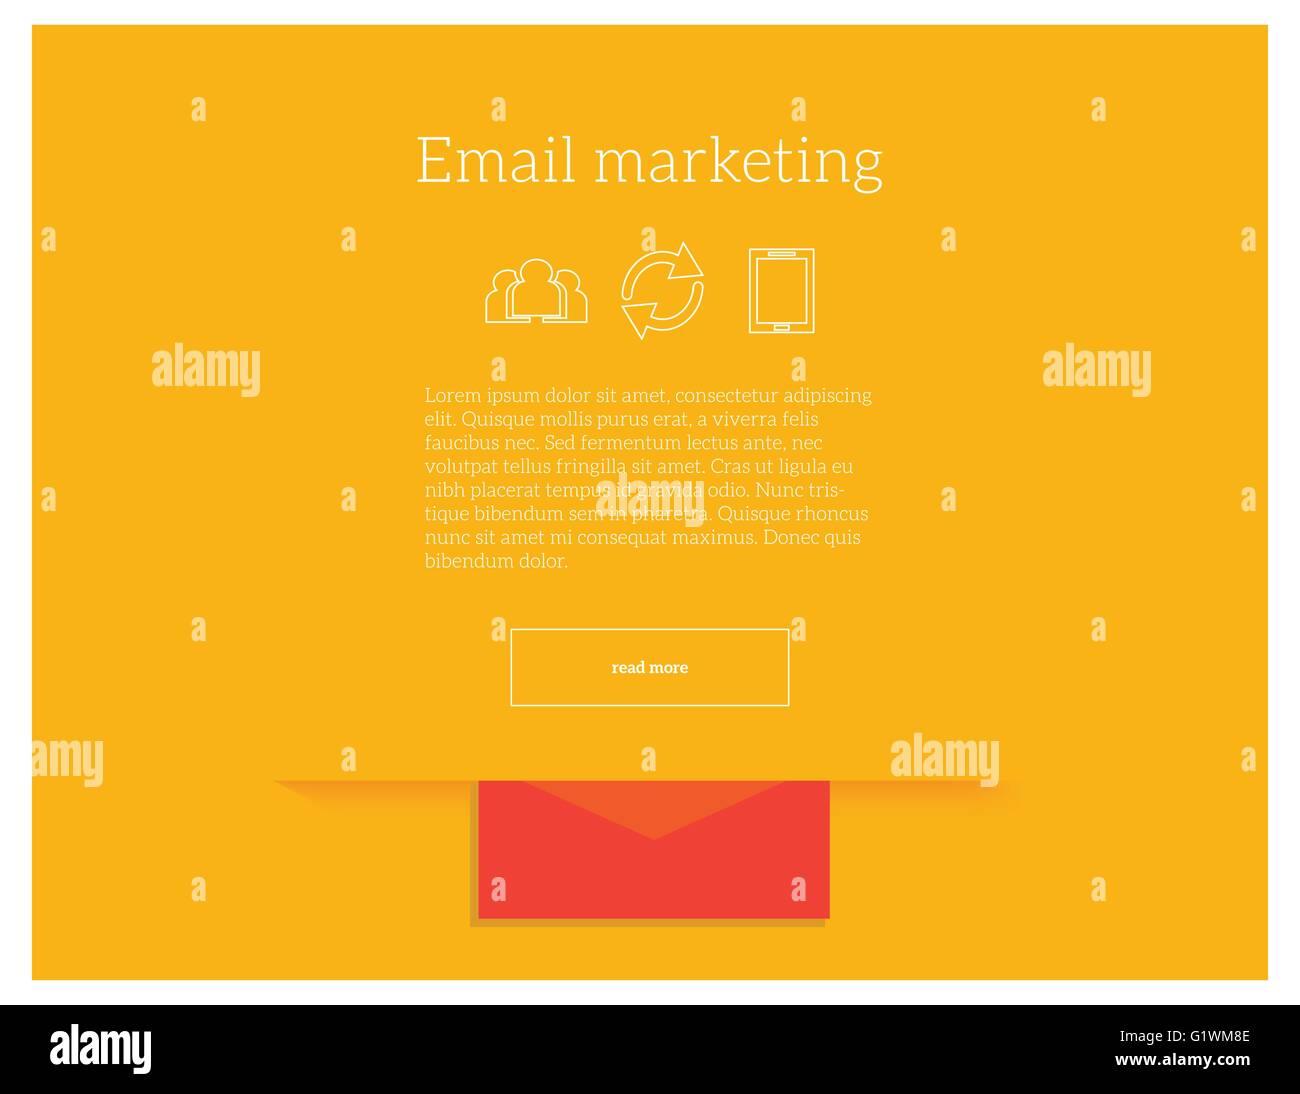 Email Marketing Vector Concept Illustration Website Landing Page